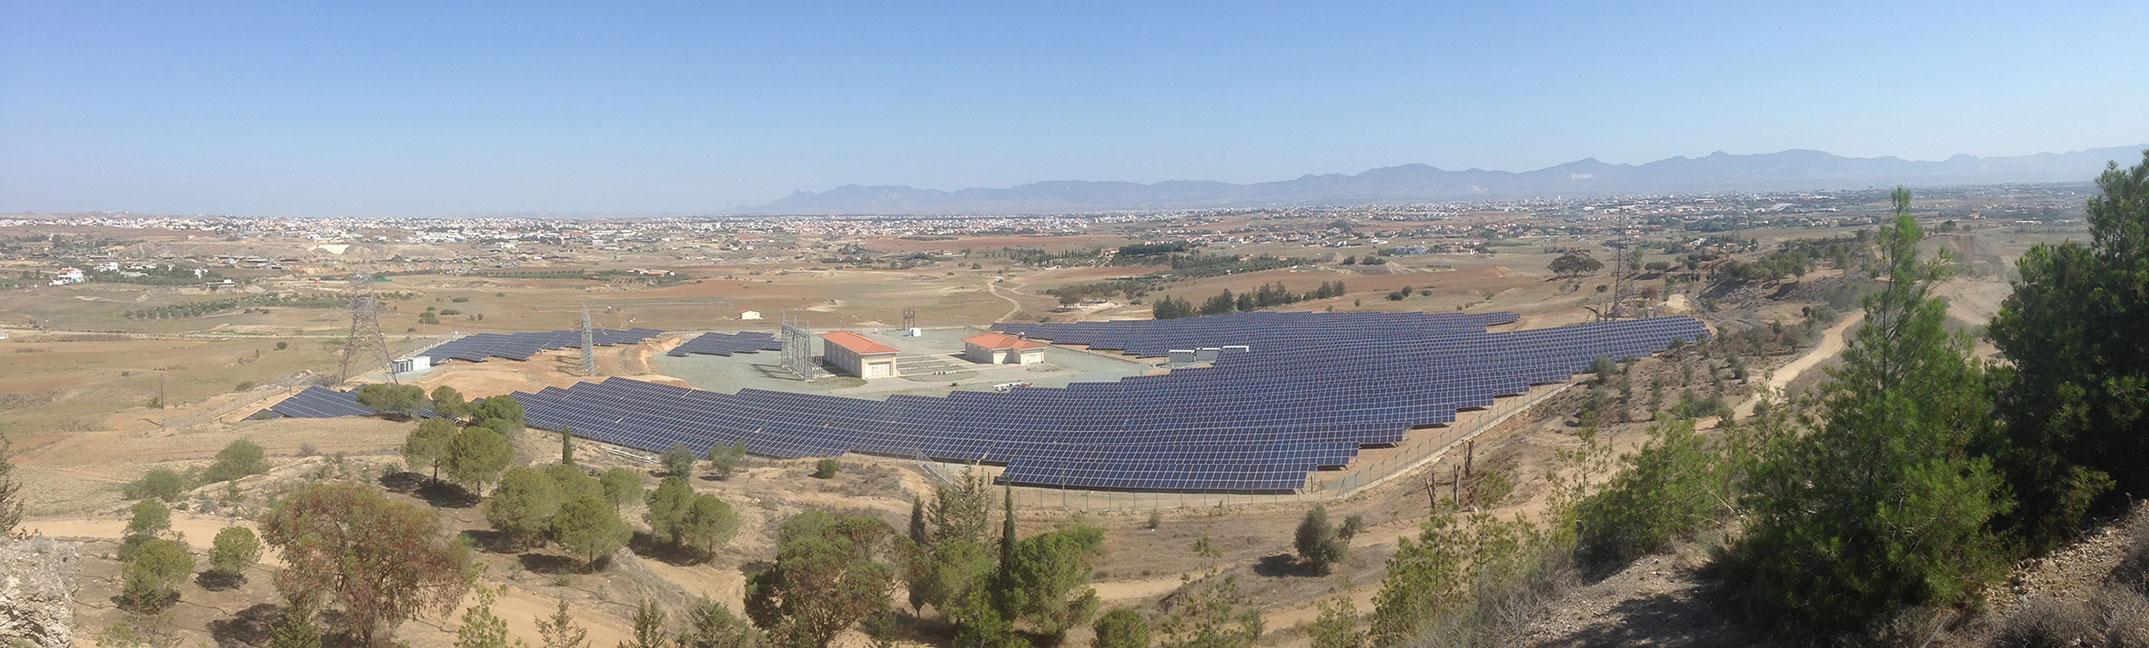 Panoranic-View-of-EAC-Tseri-PV-Park-in-Nicosia-@13062014.jpg